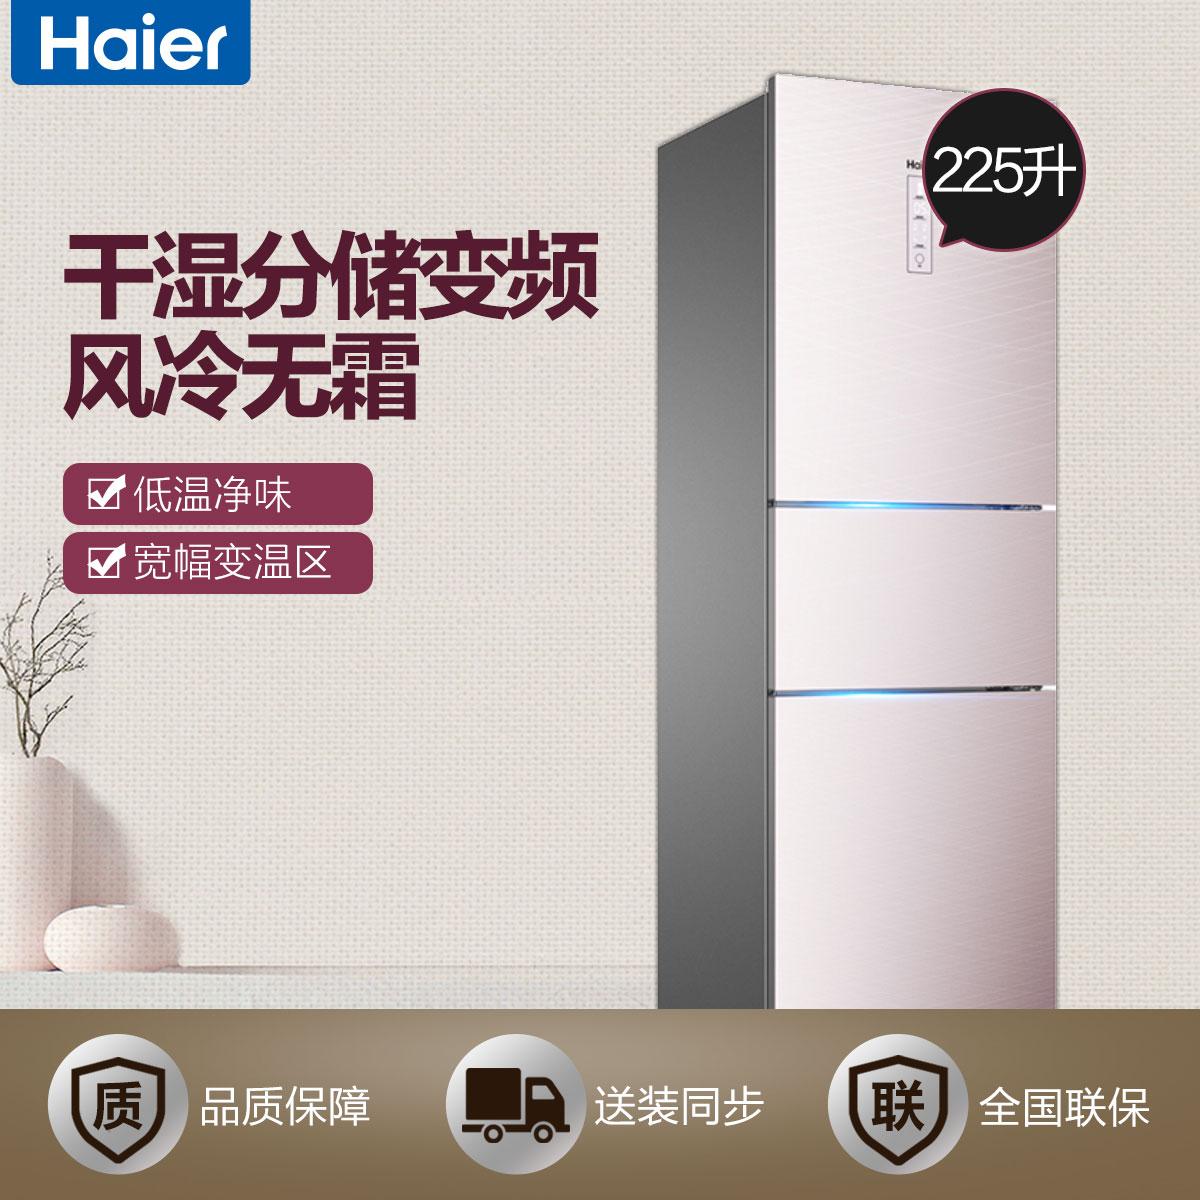 Haier/海尔 冰箱 BCD-225WDCJ(DZ)